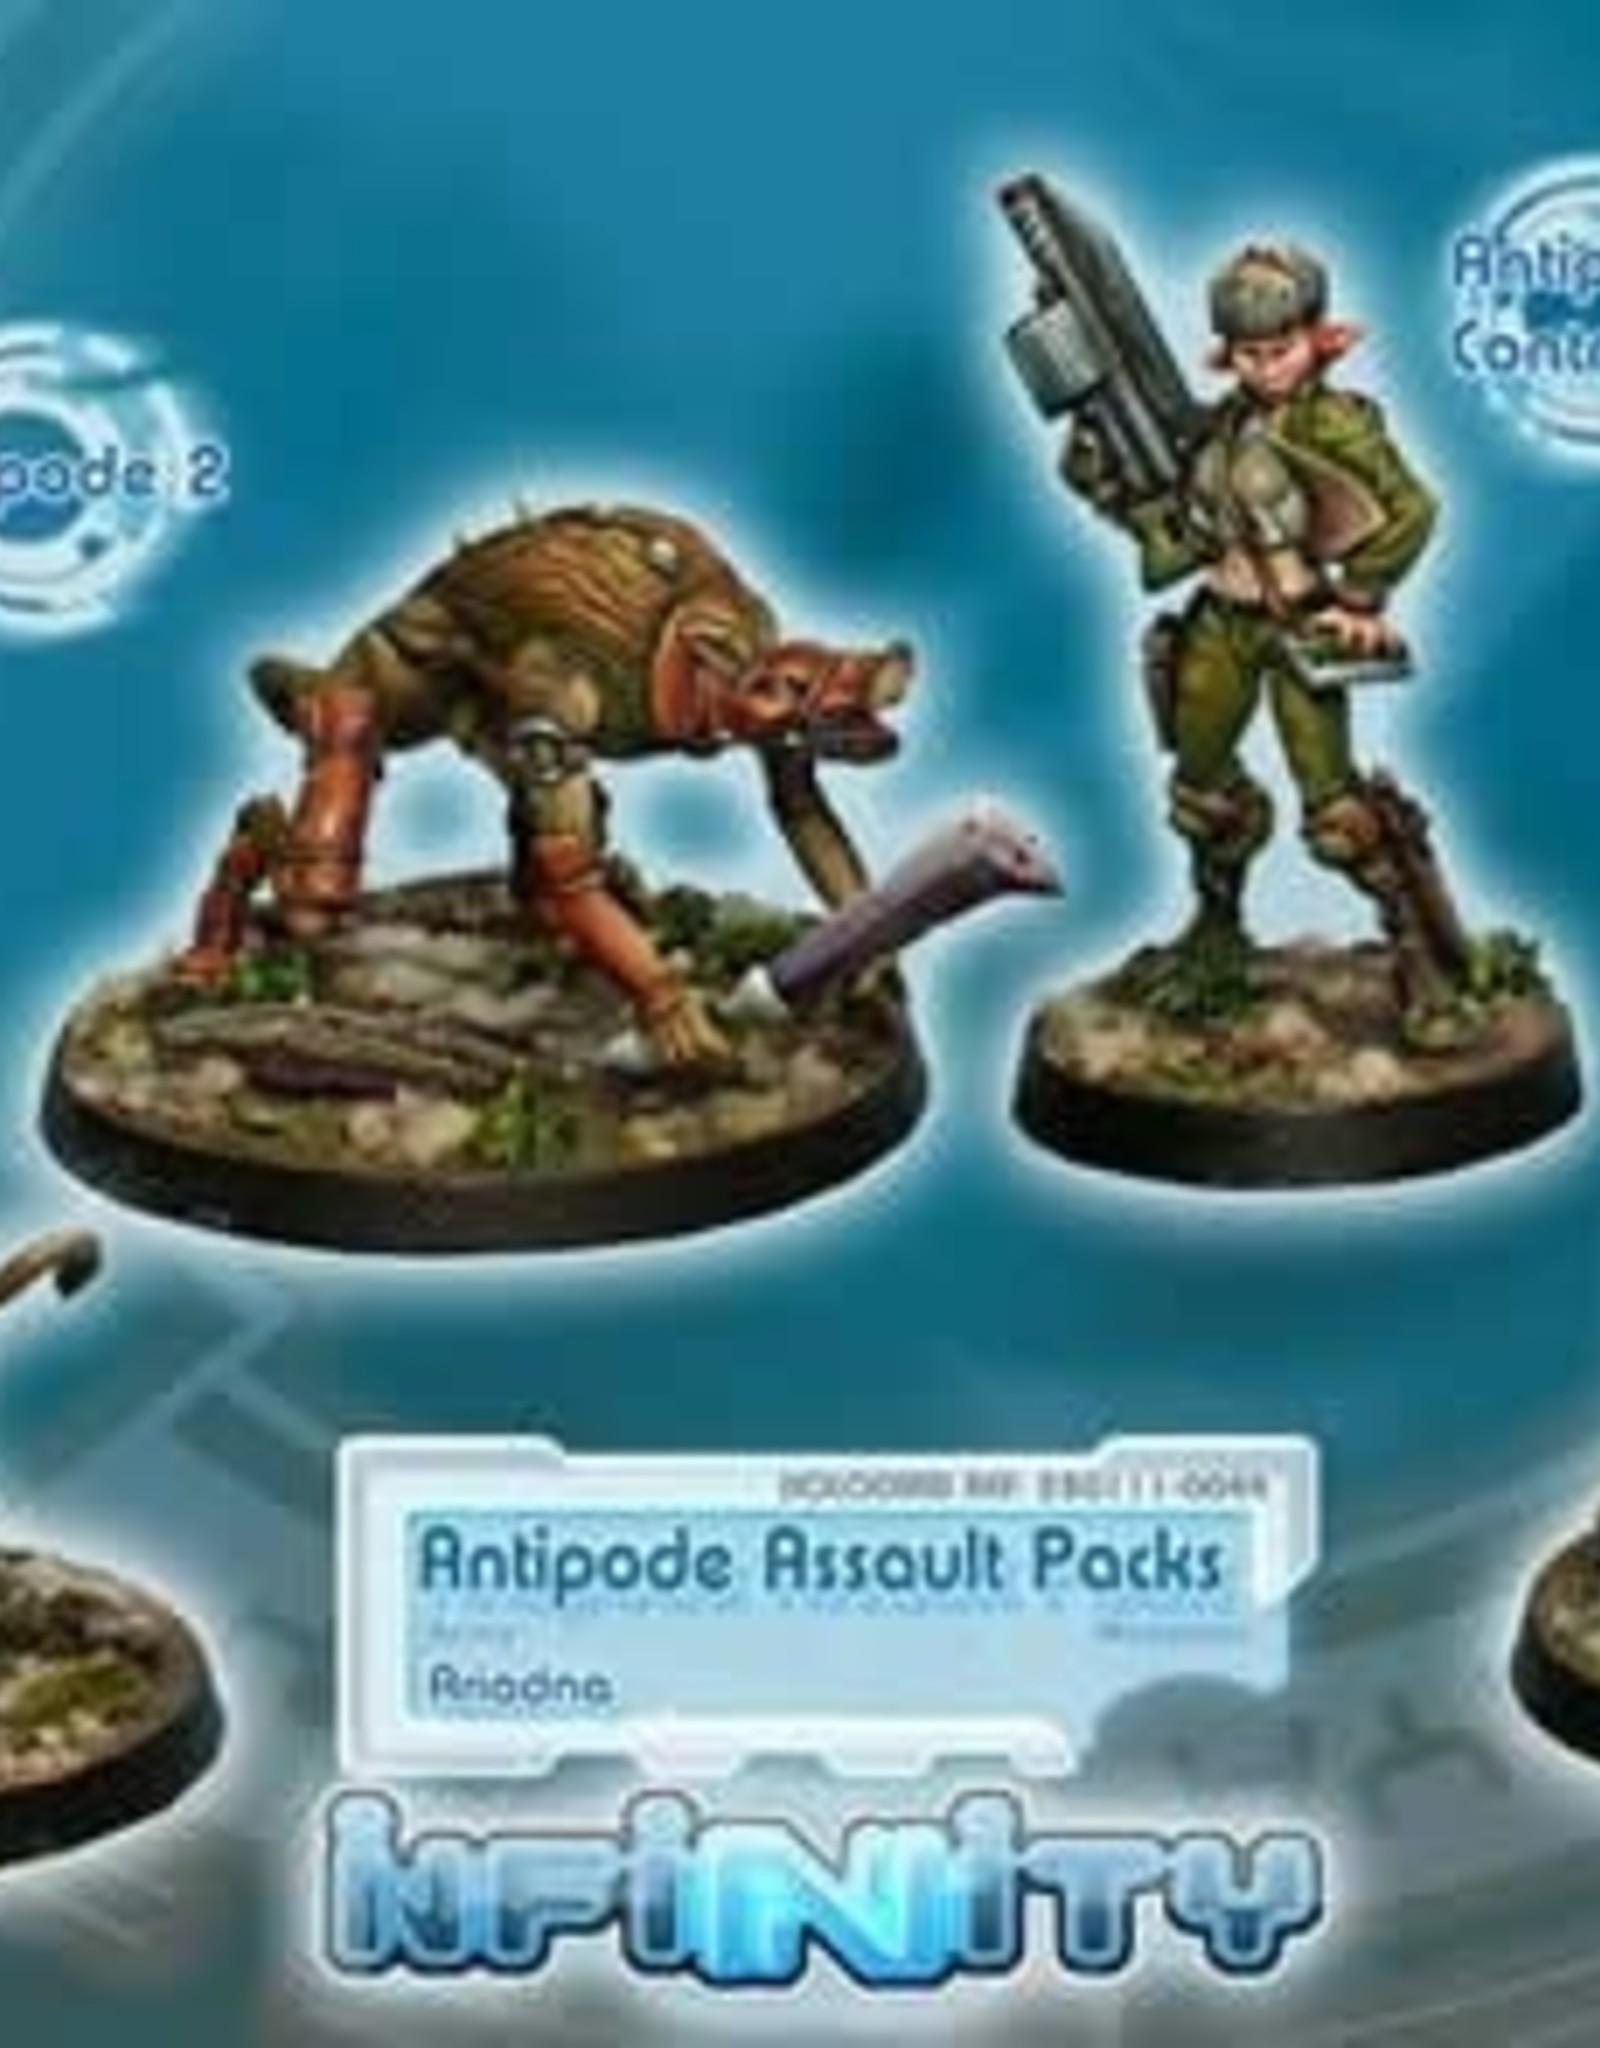 Corvus Belli Antipode Assault Packs (Contr, 3 Antipodes)